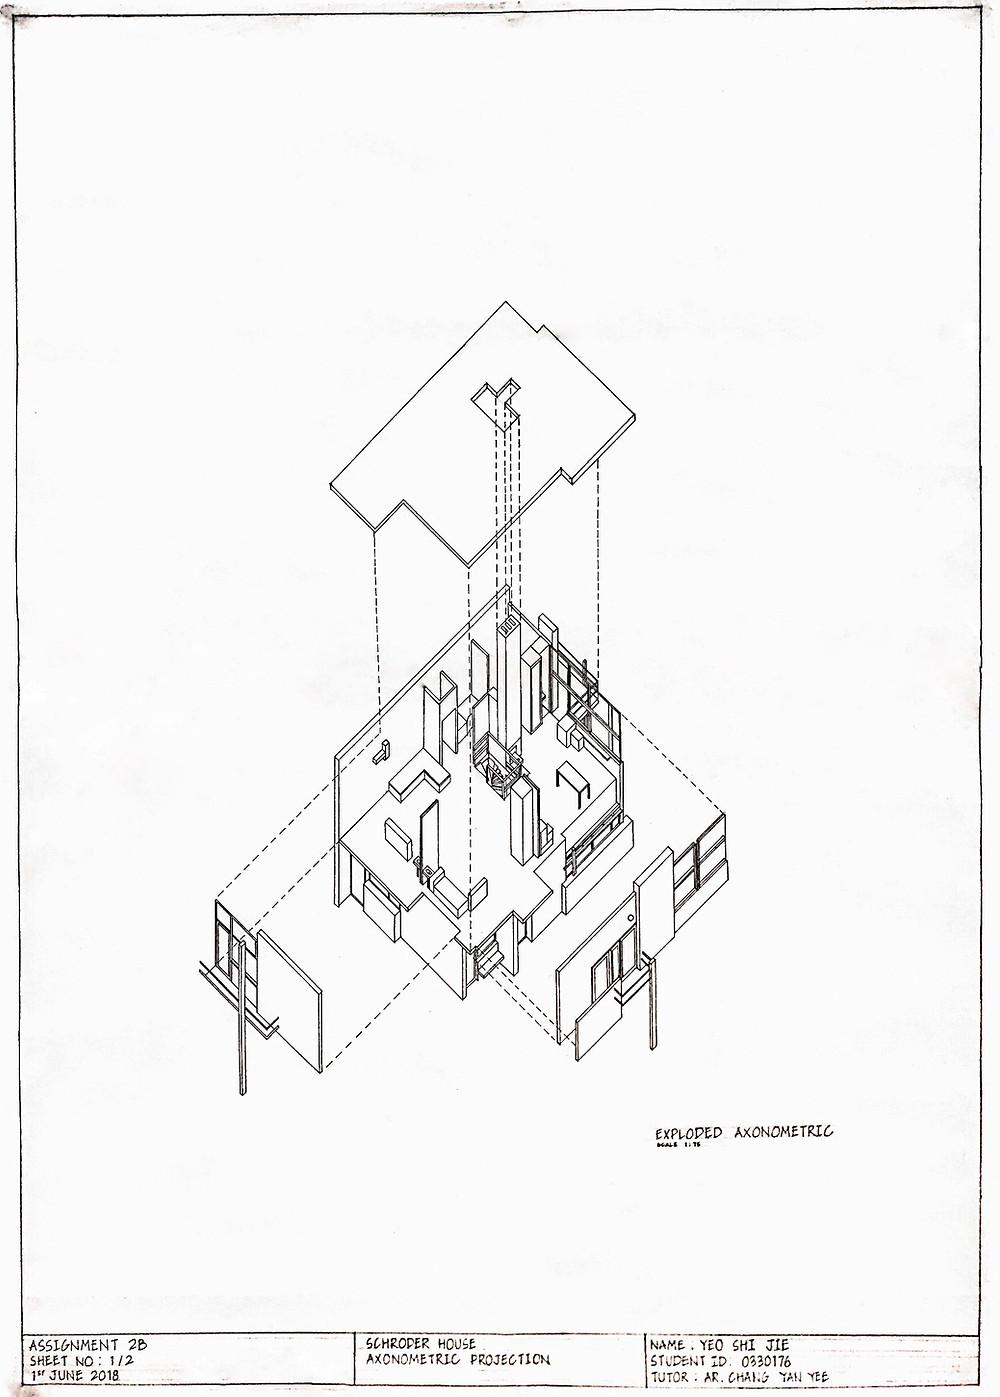 Project 2: Schroder House